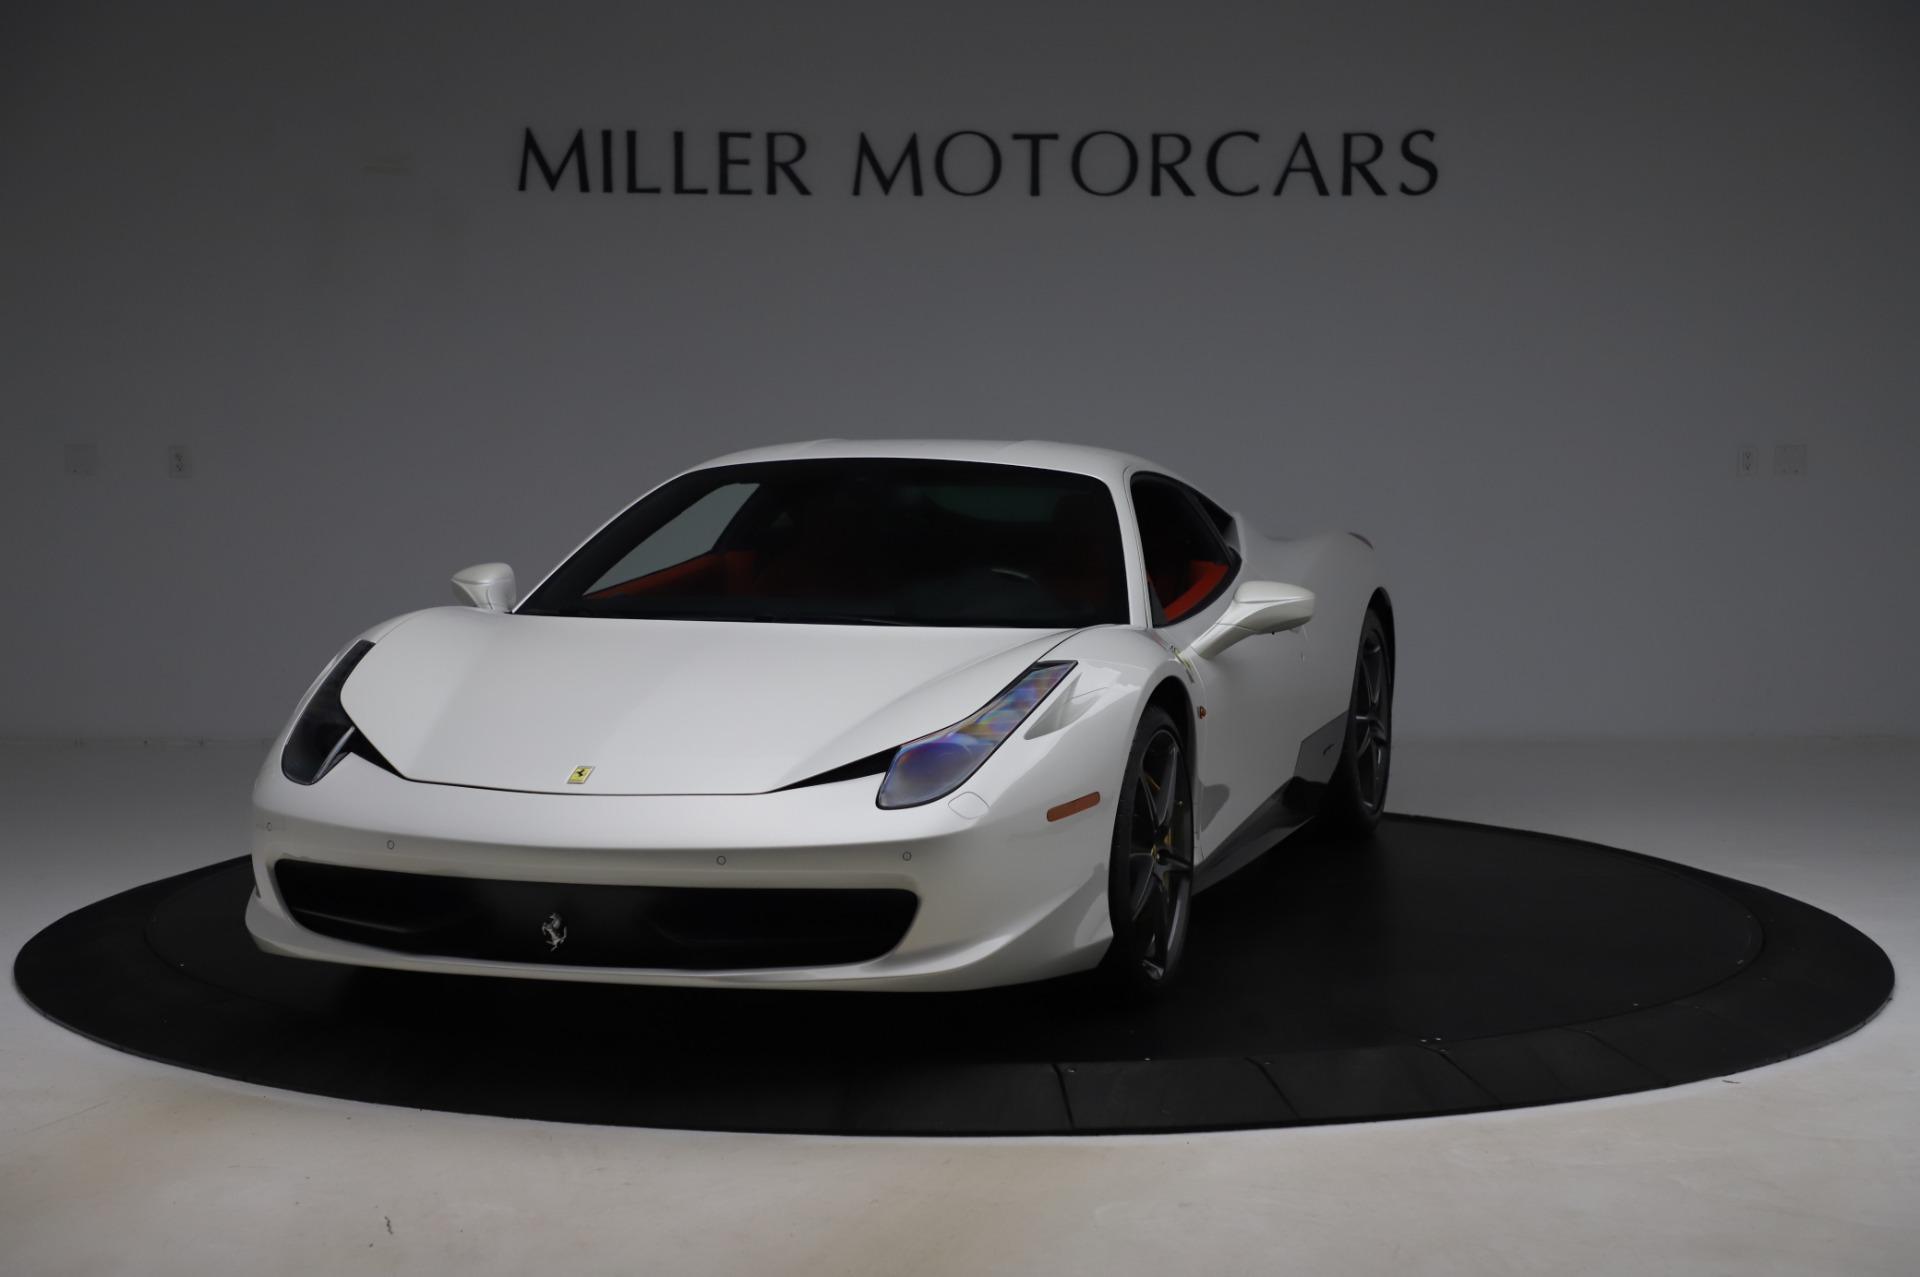 Used 2013 Ferrari 458 Italia for sale Sold at Rolls-Royce Motor Cars Greenwich in Greenwich CT 06830 1